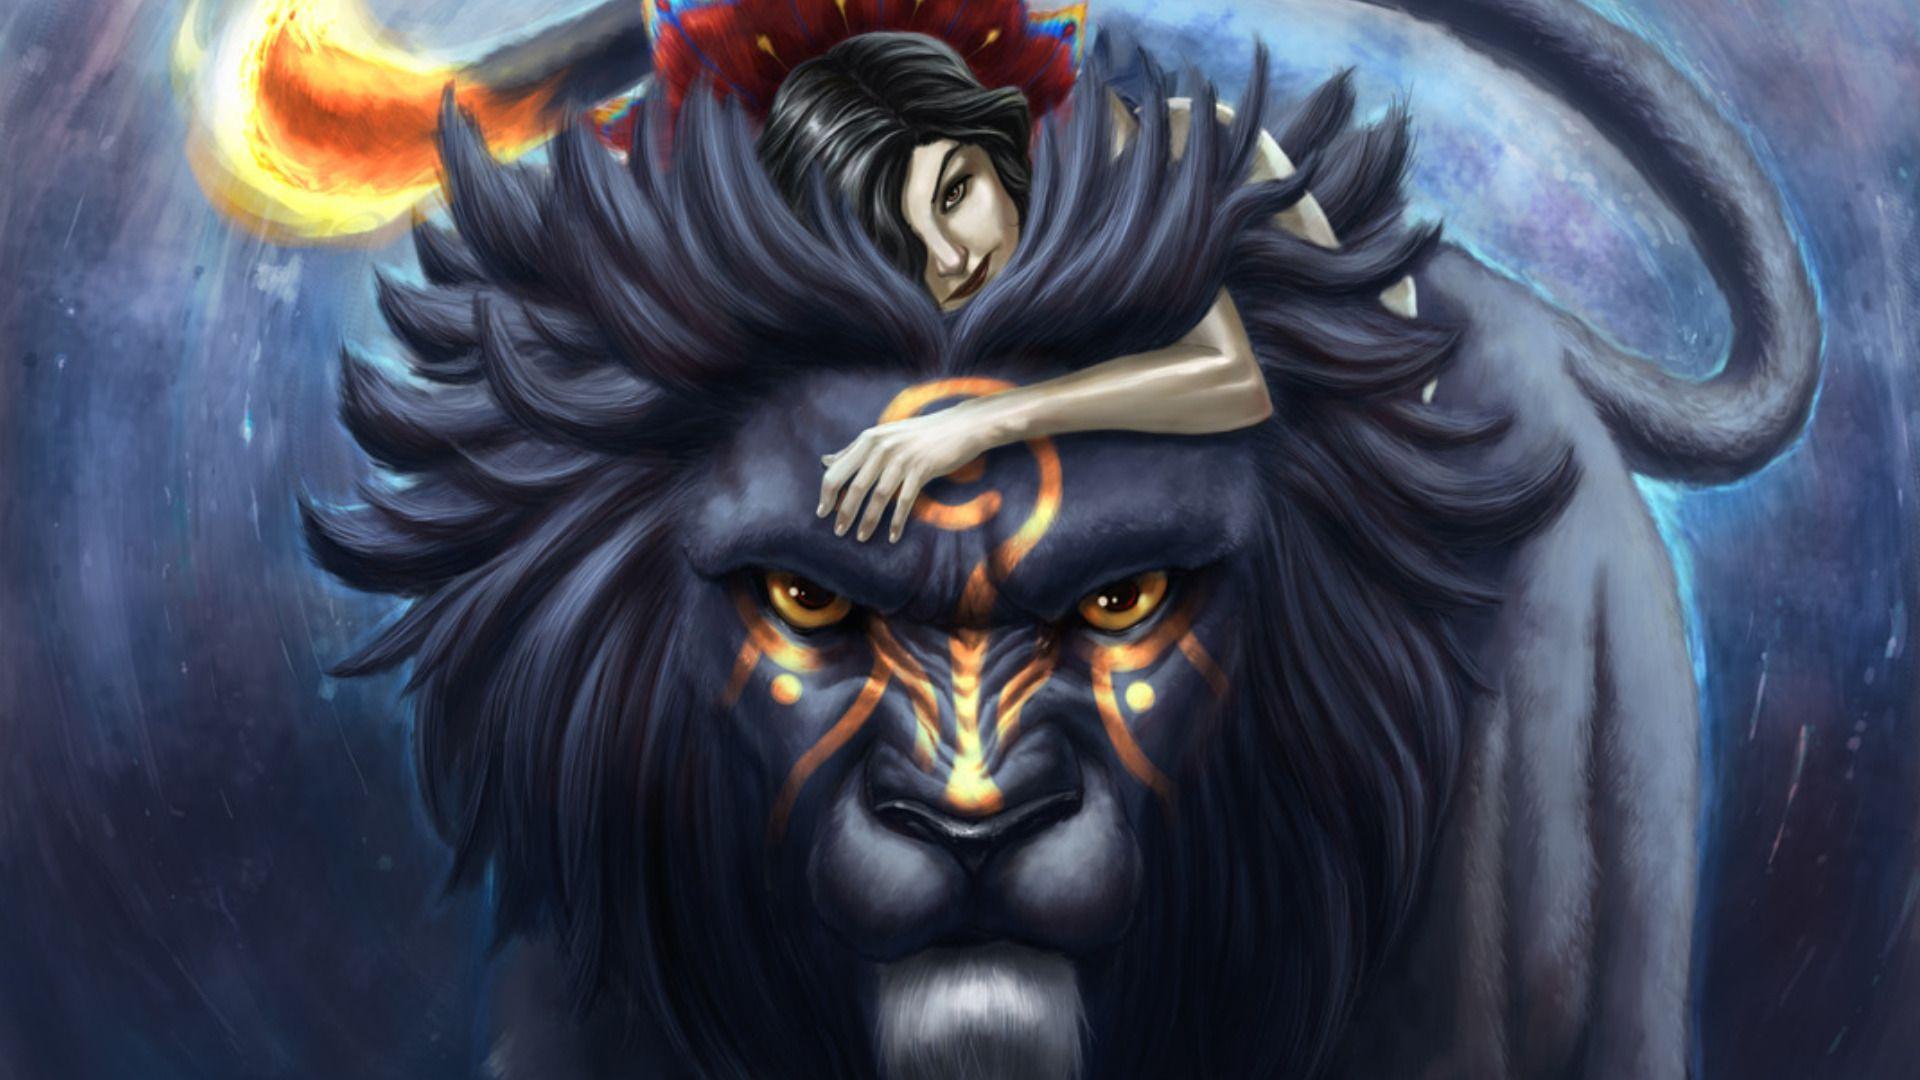 Lion Art Background Wallpaper HD